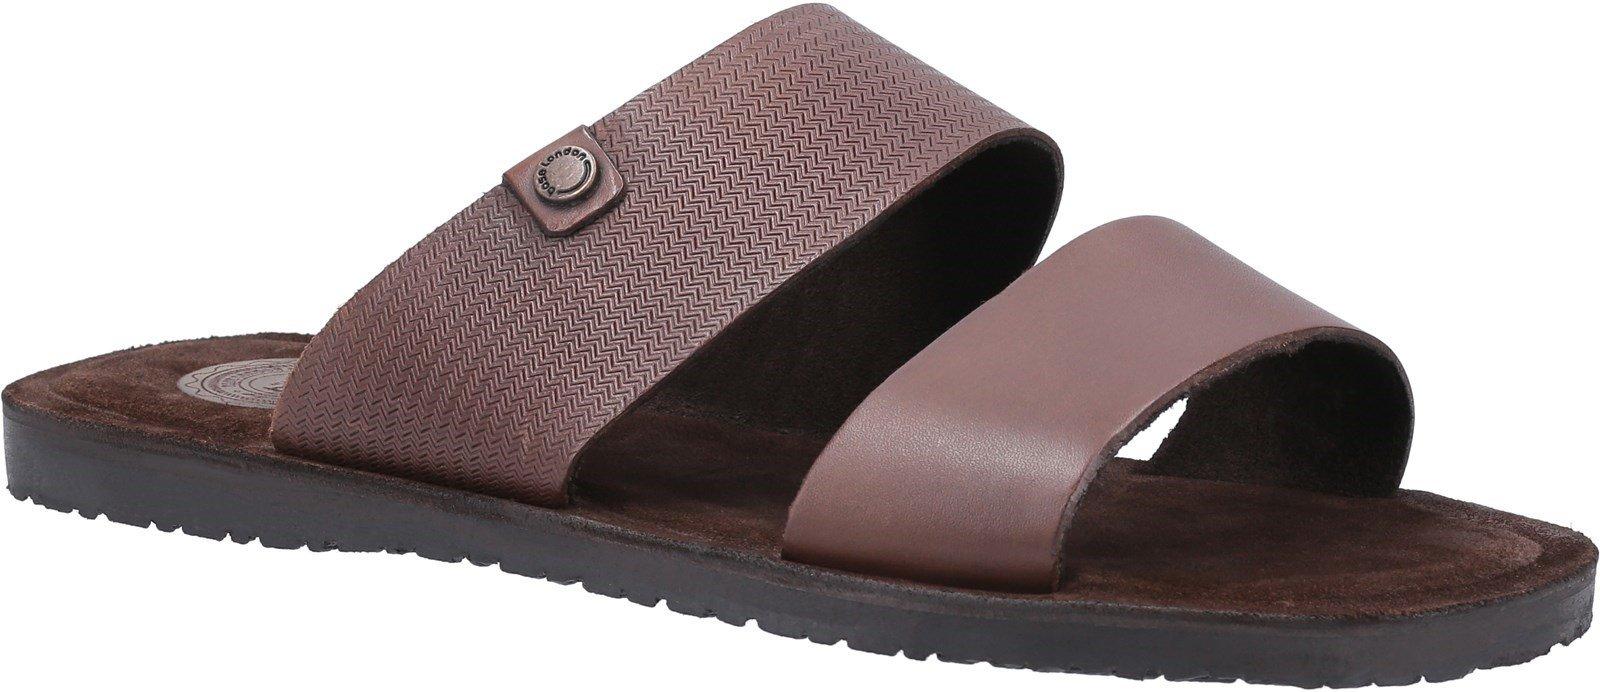 Base London Men's Julius Waxy Slip On Sandal Various Colours 30442 - Brown 6